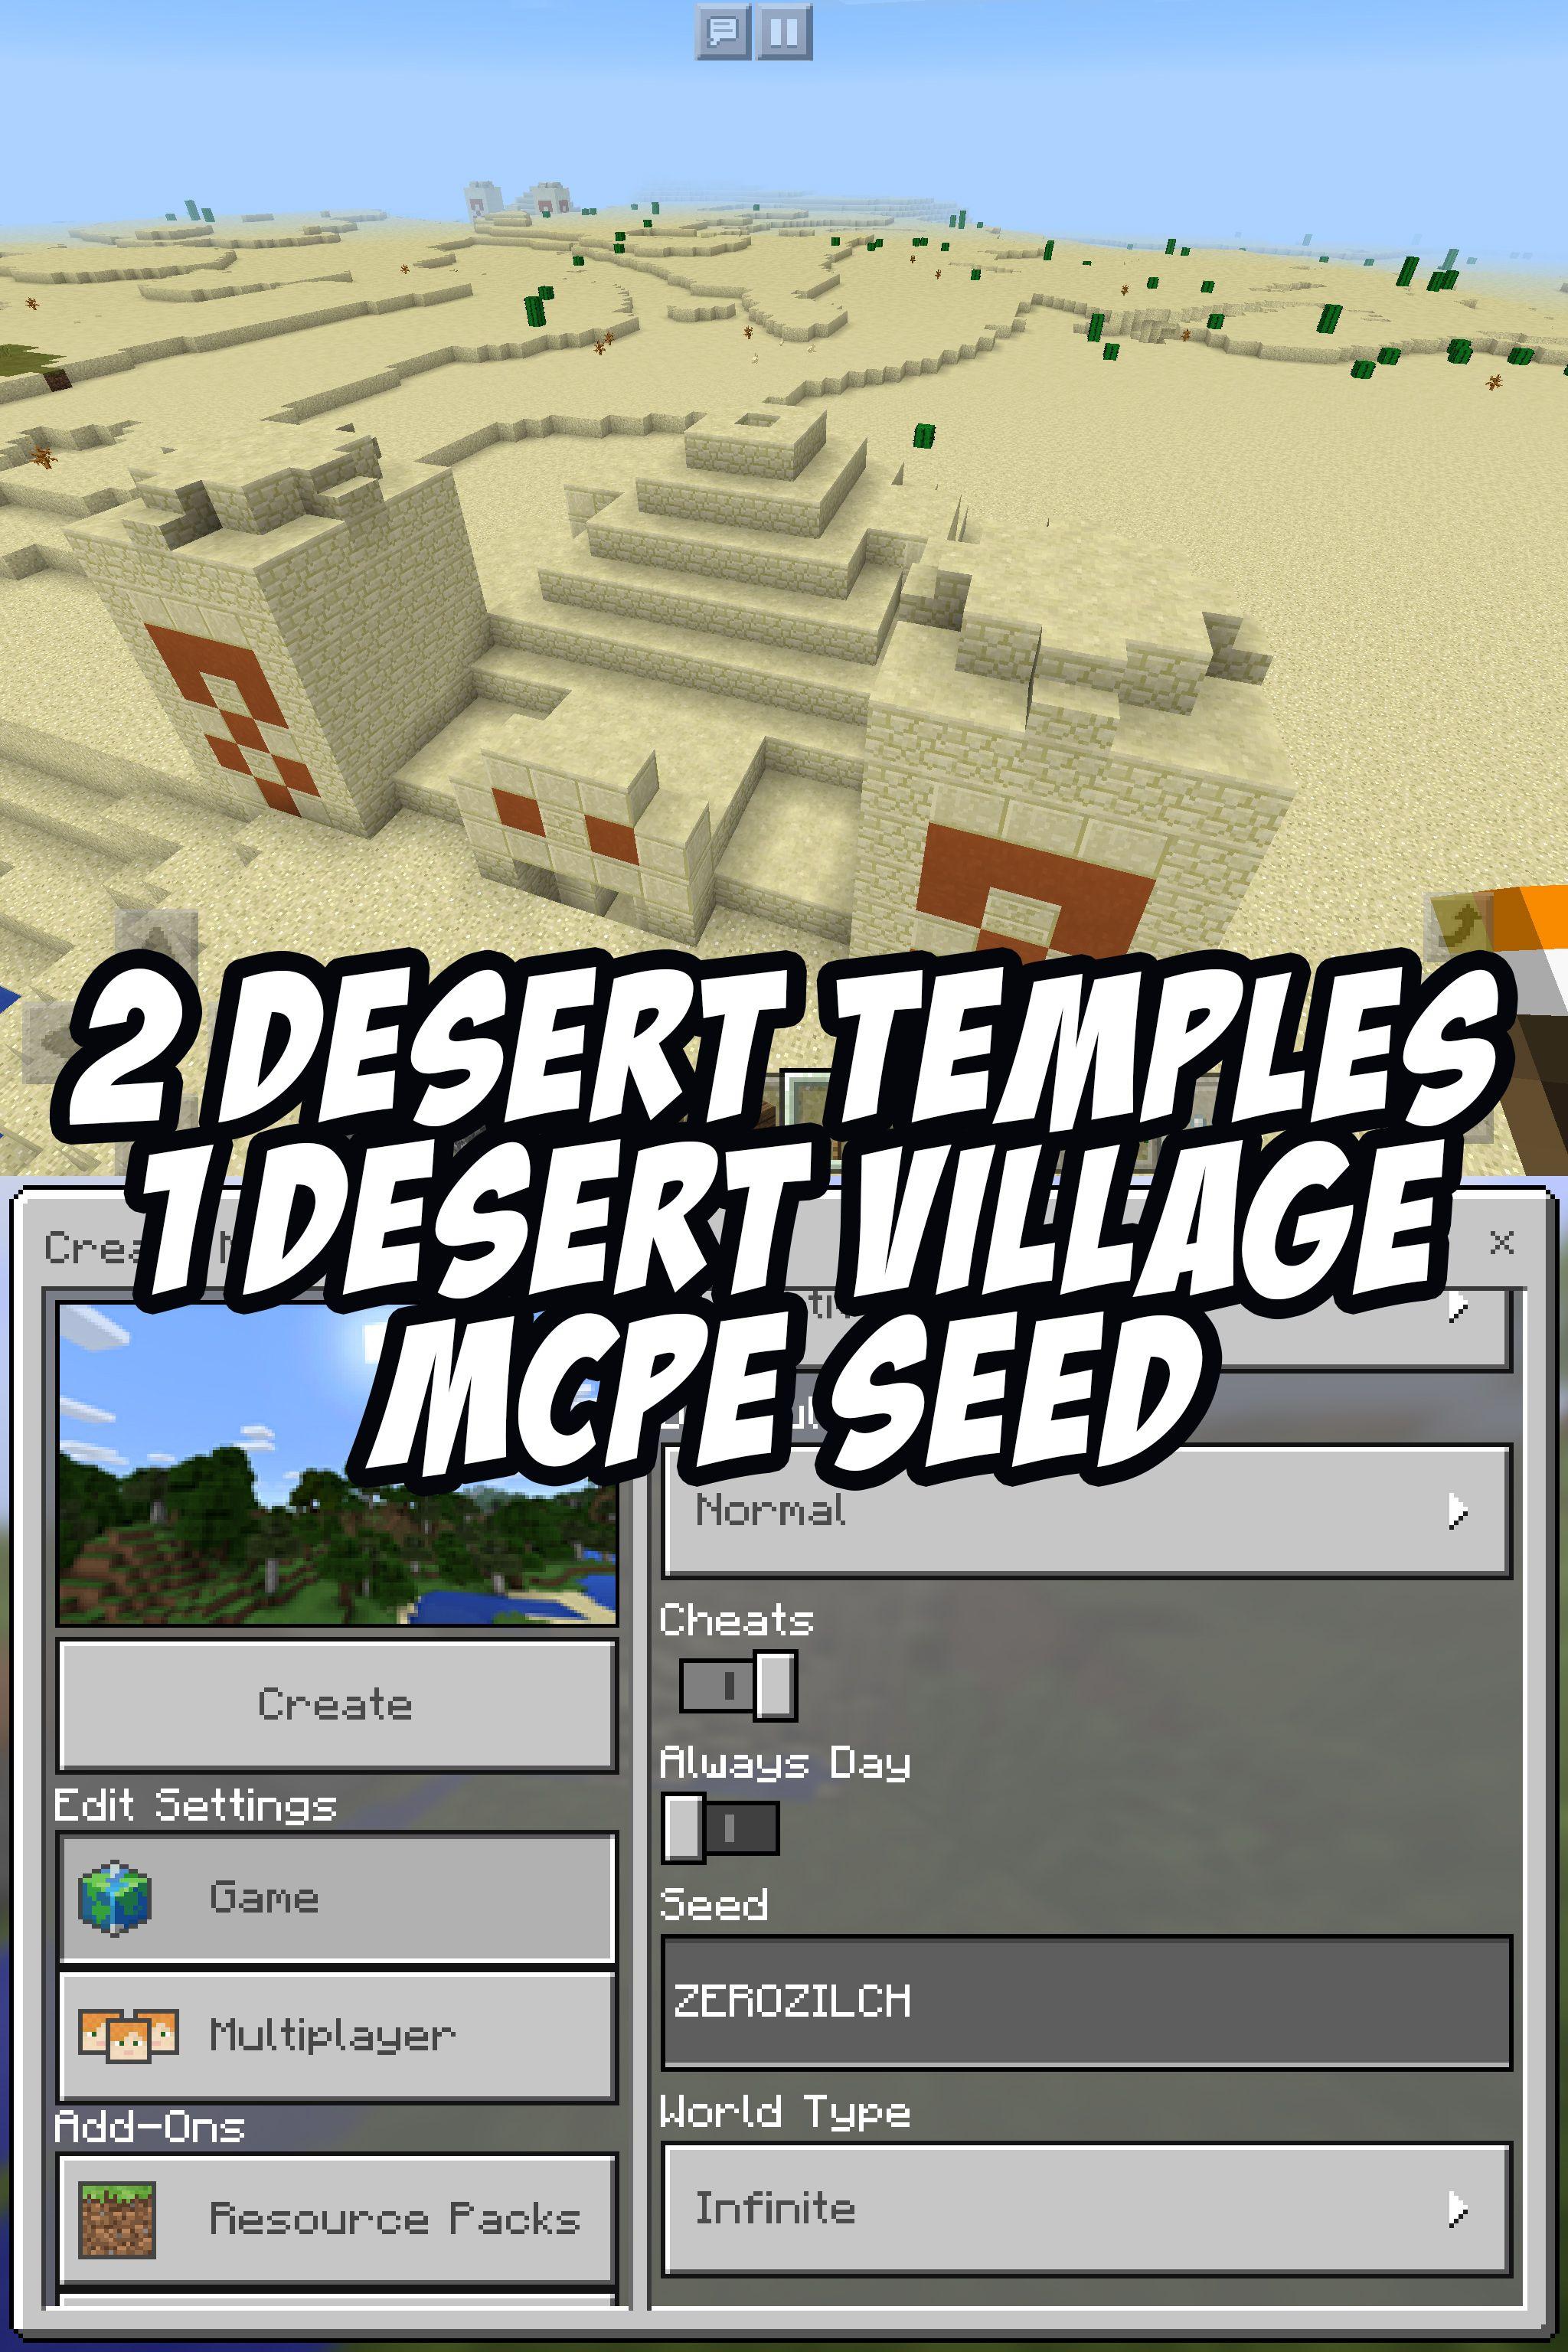 122 Desert Temples, 12 Desert Village. MCPE Seed: ZEROZILCH